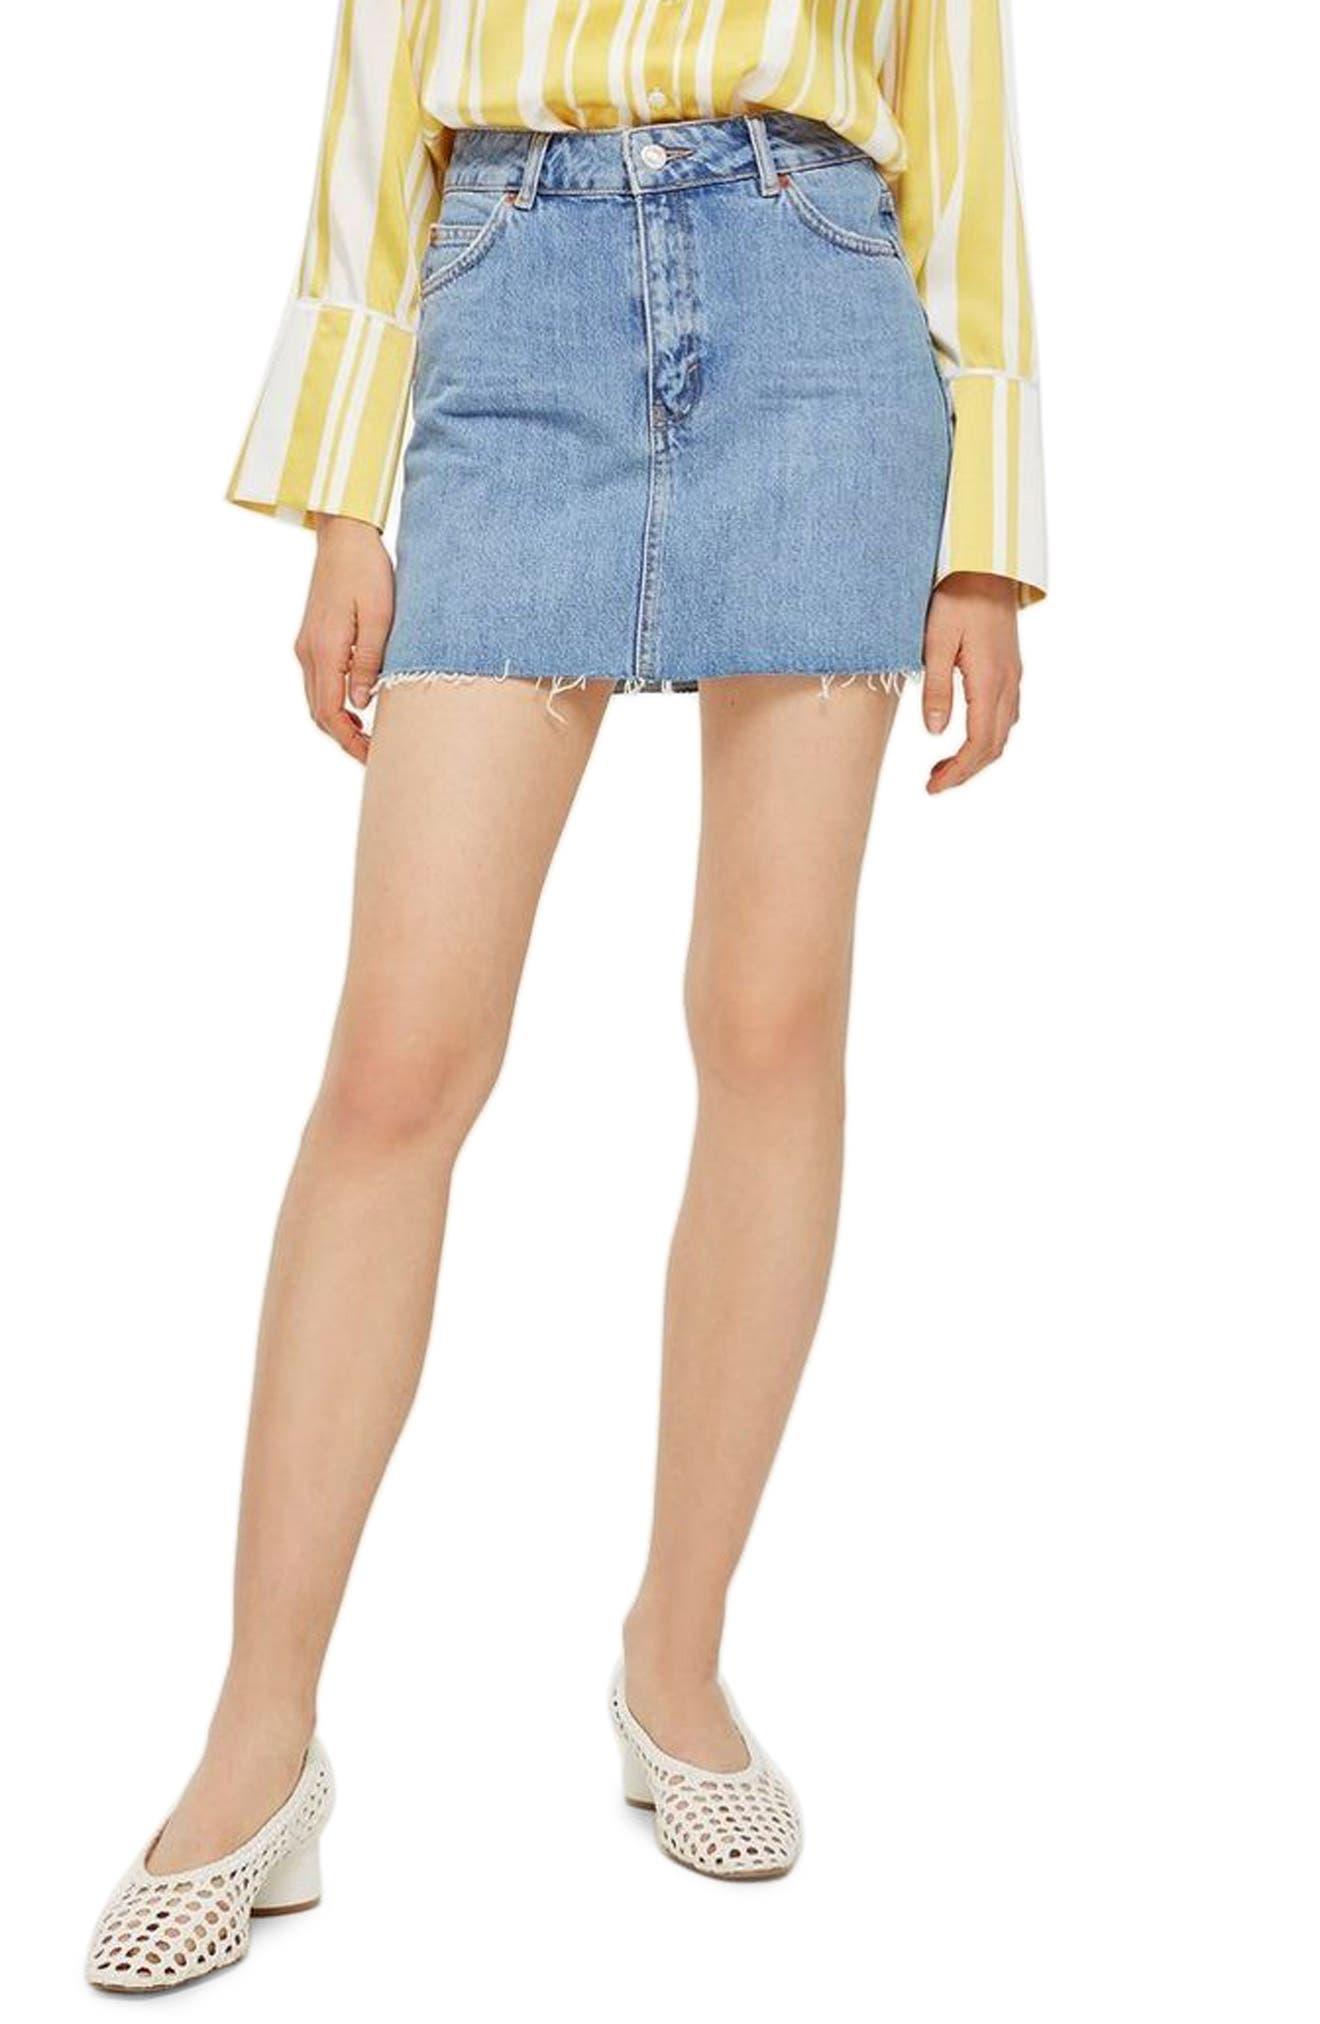 TOPSHOP, Denim Miniskirt, Main thumbnail 1, color, MID DENIM